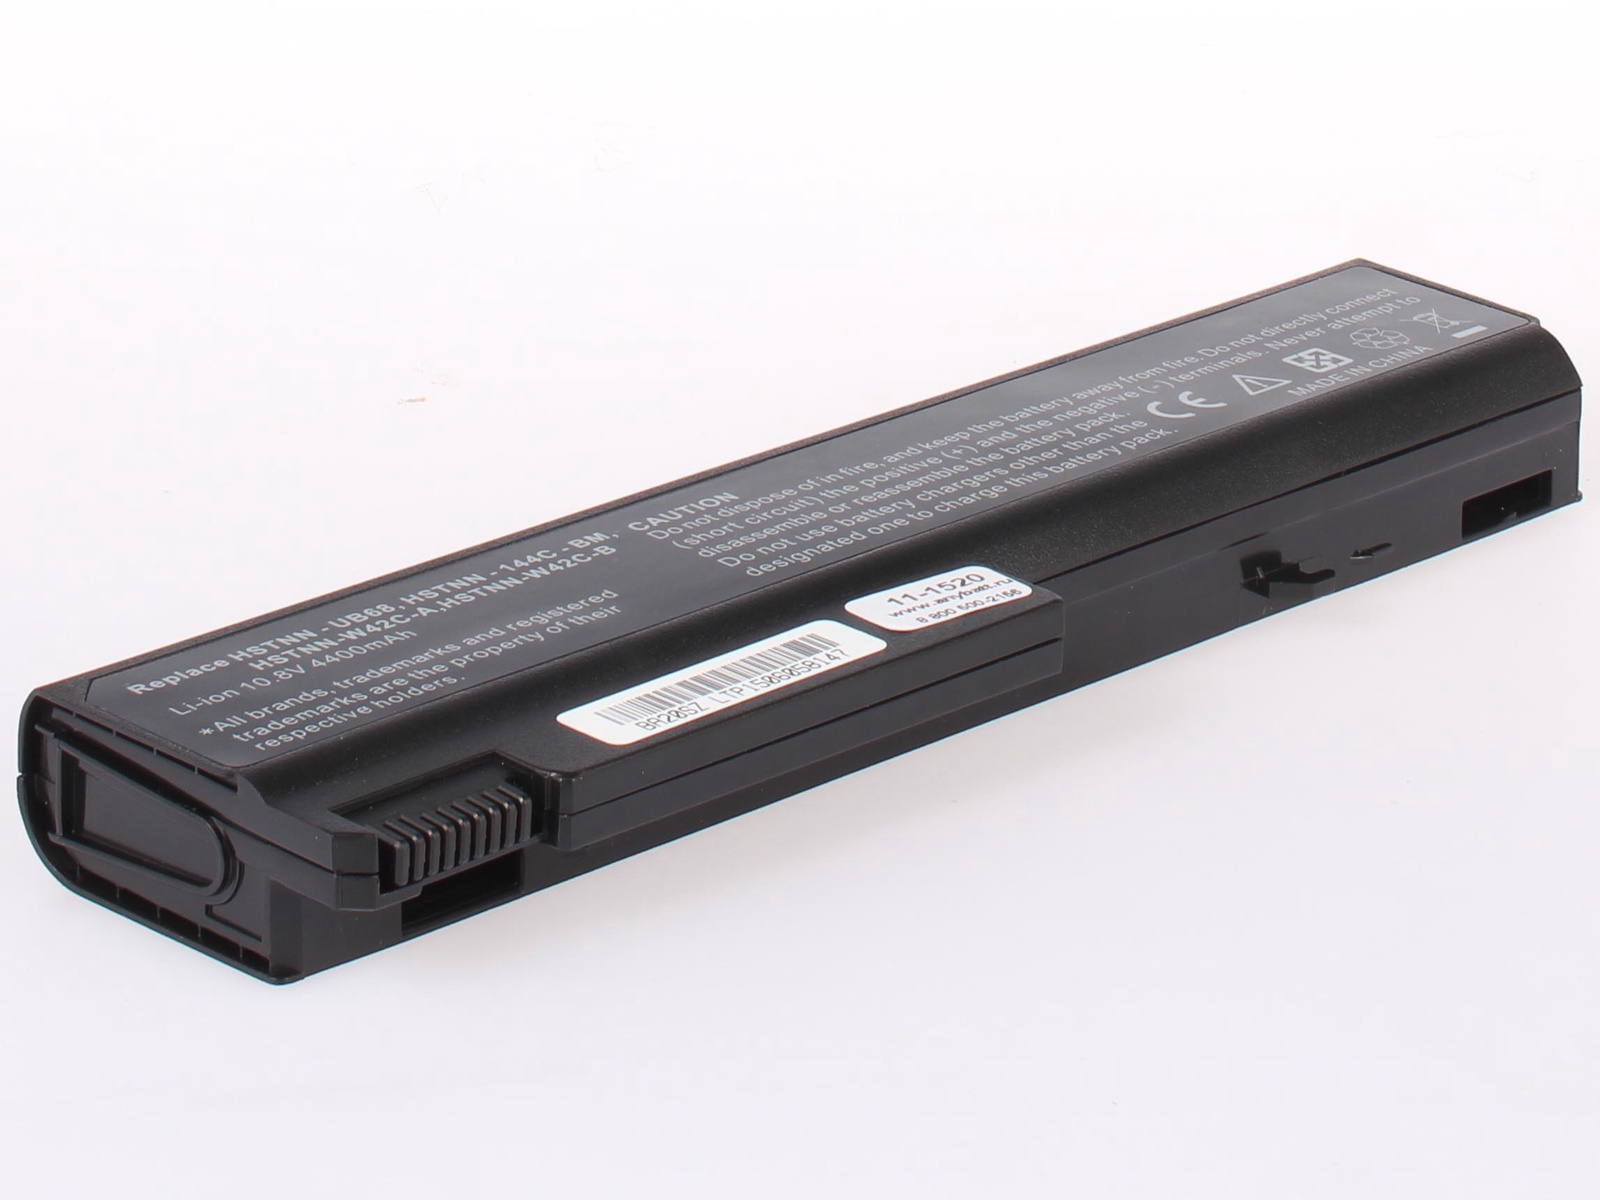 Фото - Аккумулятор для ноутбука AnyBatt для HP-Compaq ProBook 6555b (WD724EA), ProBook 6445b, ProBook 6550b (WD705EA), ProBook 6550b WD705EA, ProBook 645 G1 (F4N62AW), ProBook 645 G1 F4N62AW, ProBook 6450b (WD774EA) аккумуляторная батарея topon top 6730b 4400мач для ноутбуков hp compaq probook 6440b 6445b 6450b 6530b 6535b 6540b 6545b 6550b 6555b 6730b 6735b 6930p elitebook 8440p 8440w